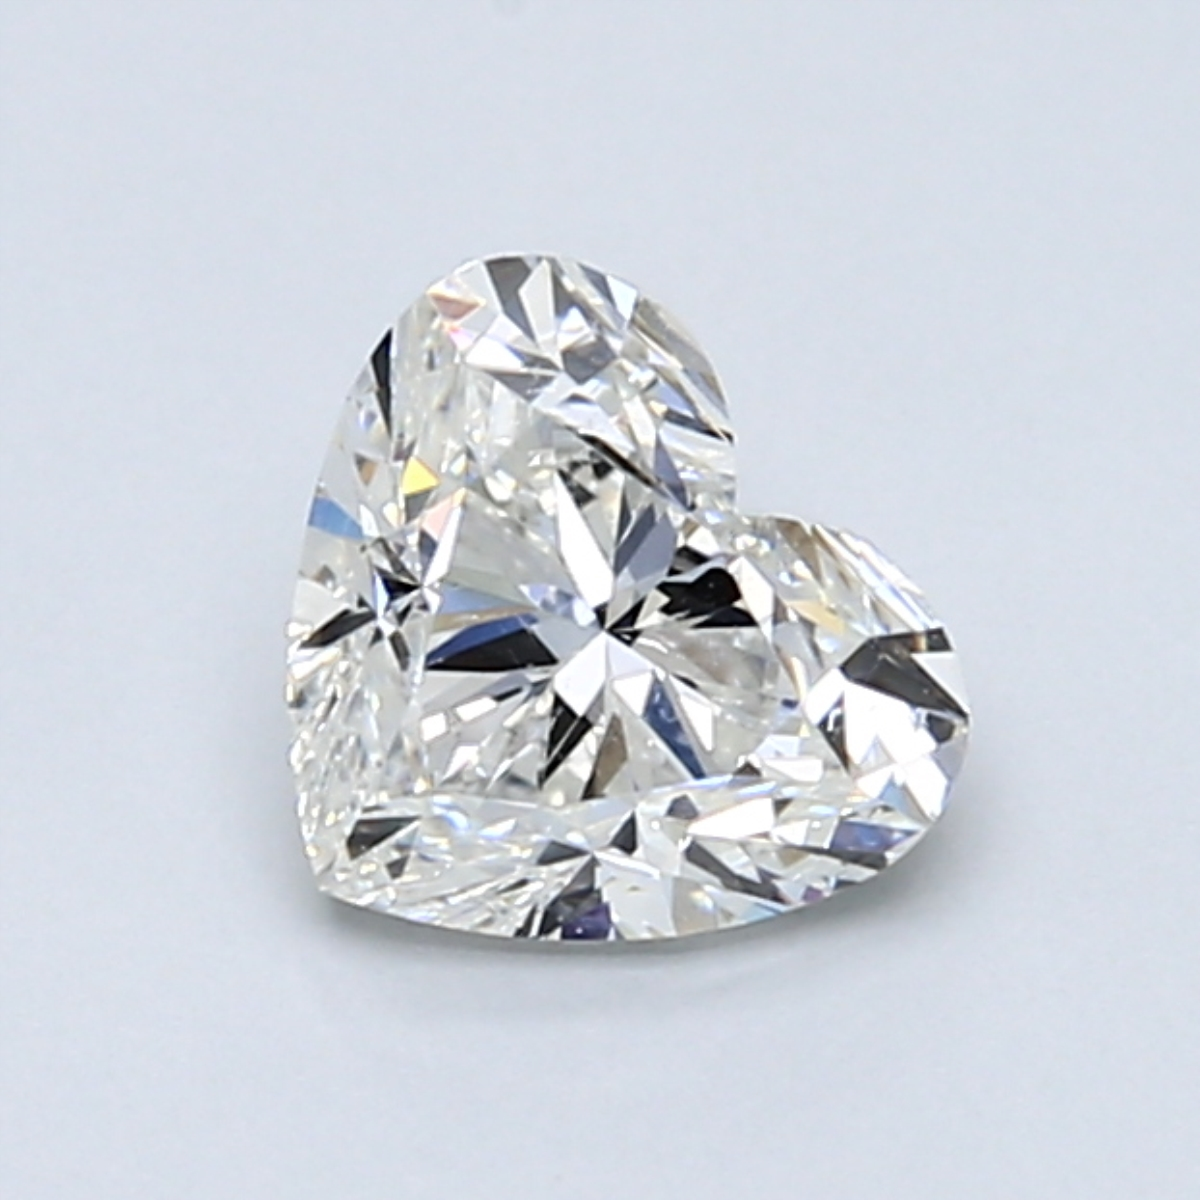 .90 carat Heart Diamond, Good cut, graded by the GIA laboratories.